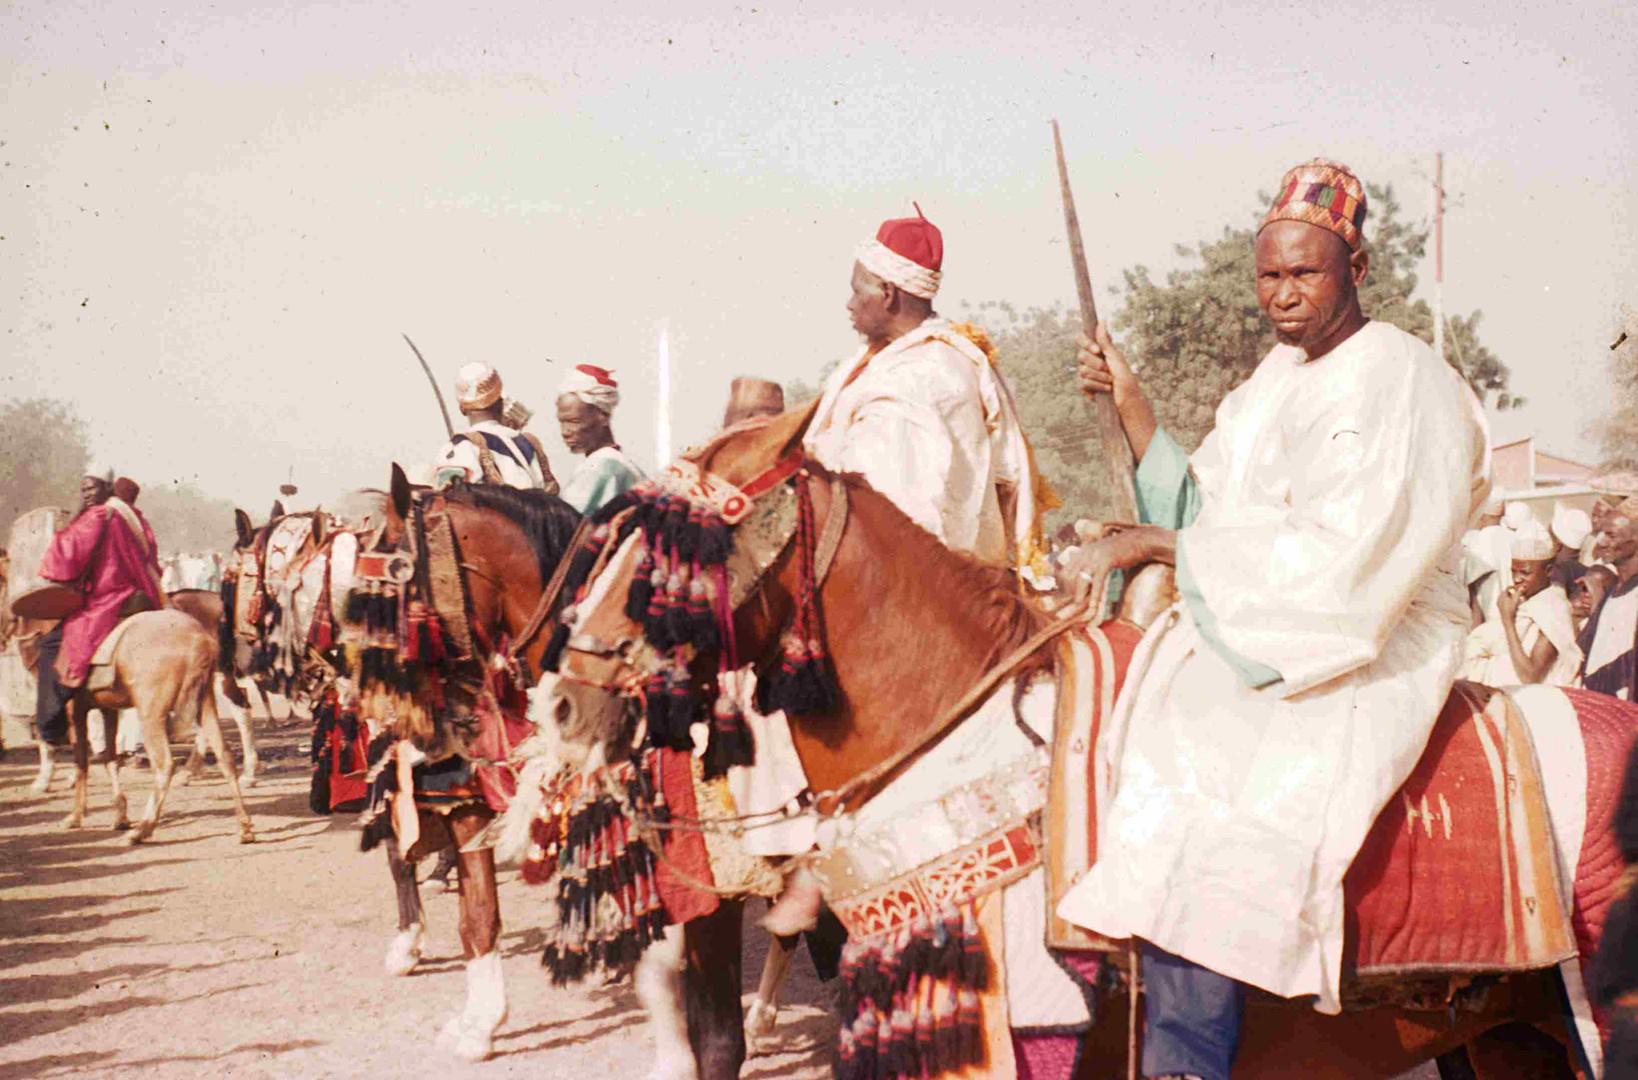 1959_1960_Africa_03130.jpg